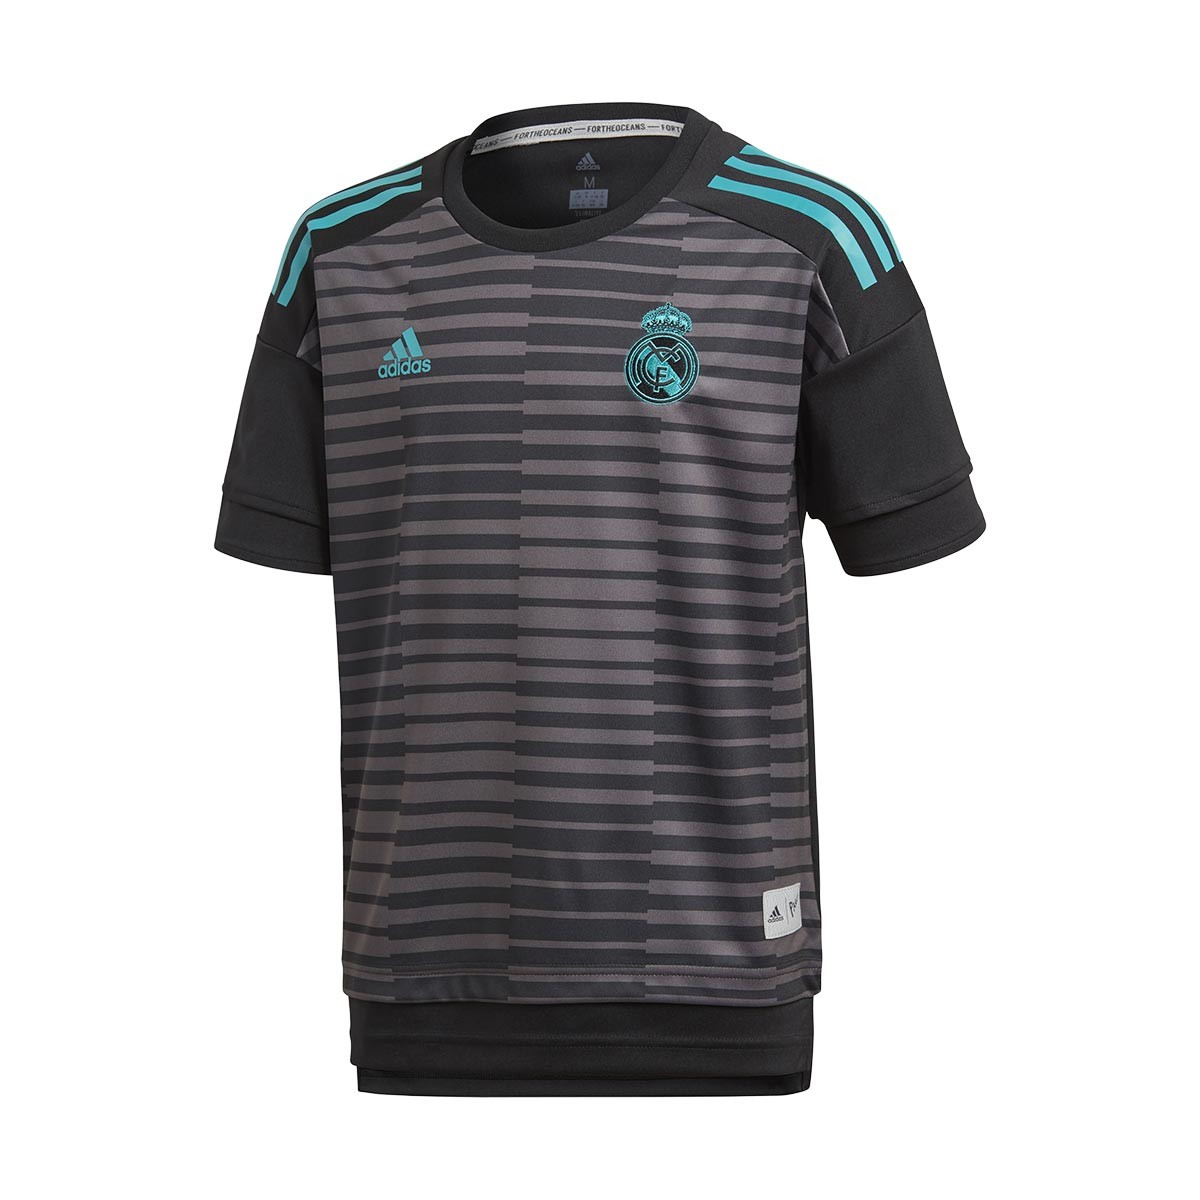 ... Camiseta Real Madrid Training 2017-2018 Niño Black-Granite. CATEGORY